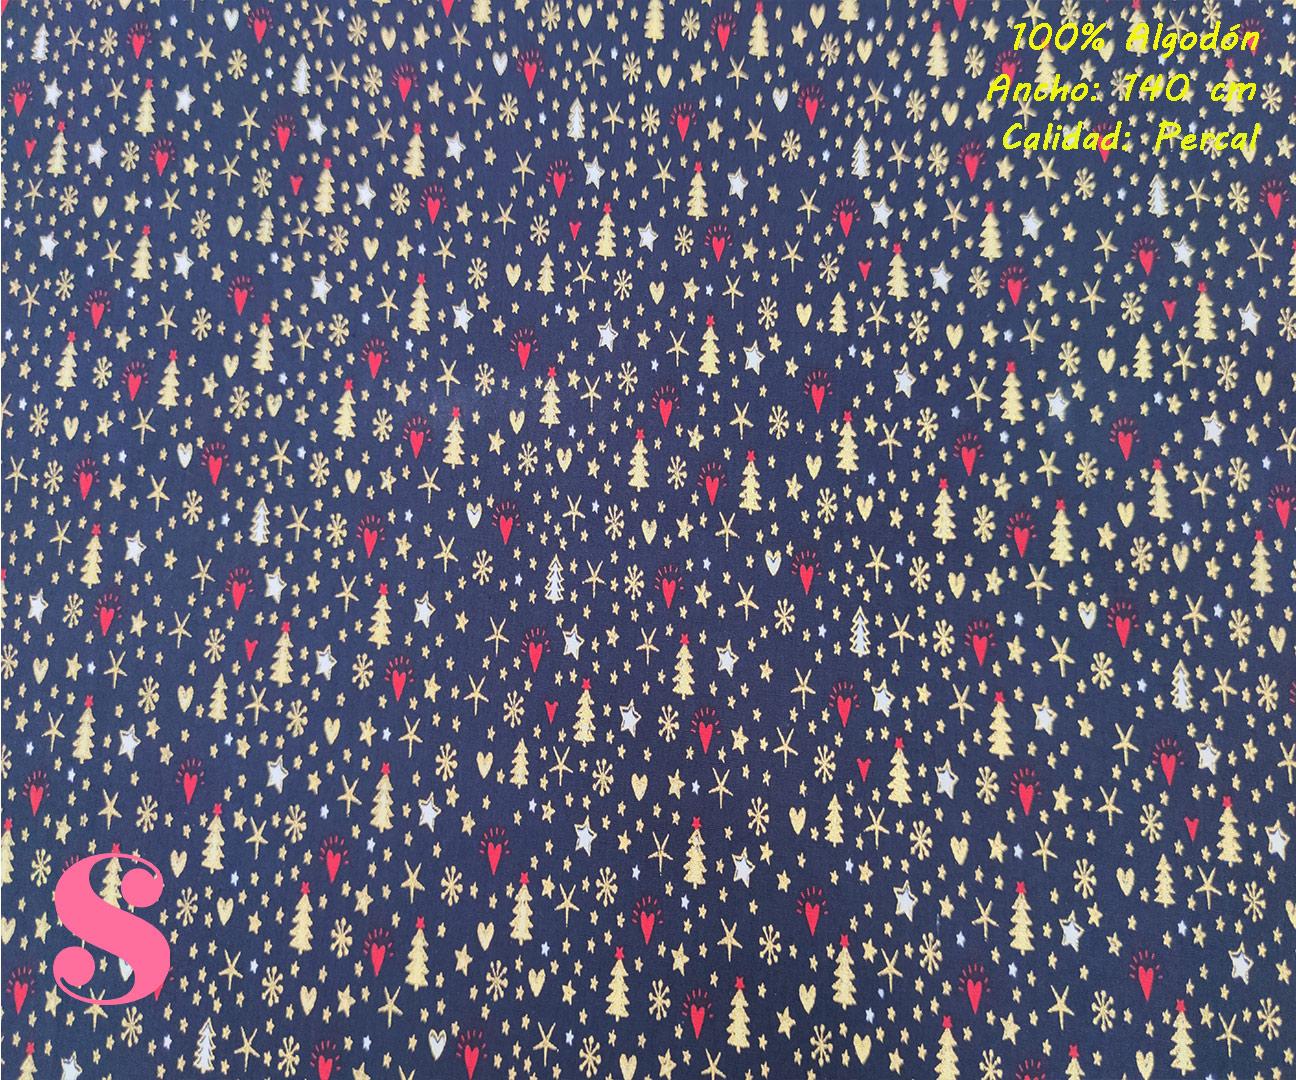 623-adornos-dorados-fondo-marino-navidad-tejidos-algodón-estampado-percal,Tejido Estampado Mini Adornos de Navidad fondo Marino